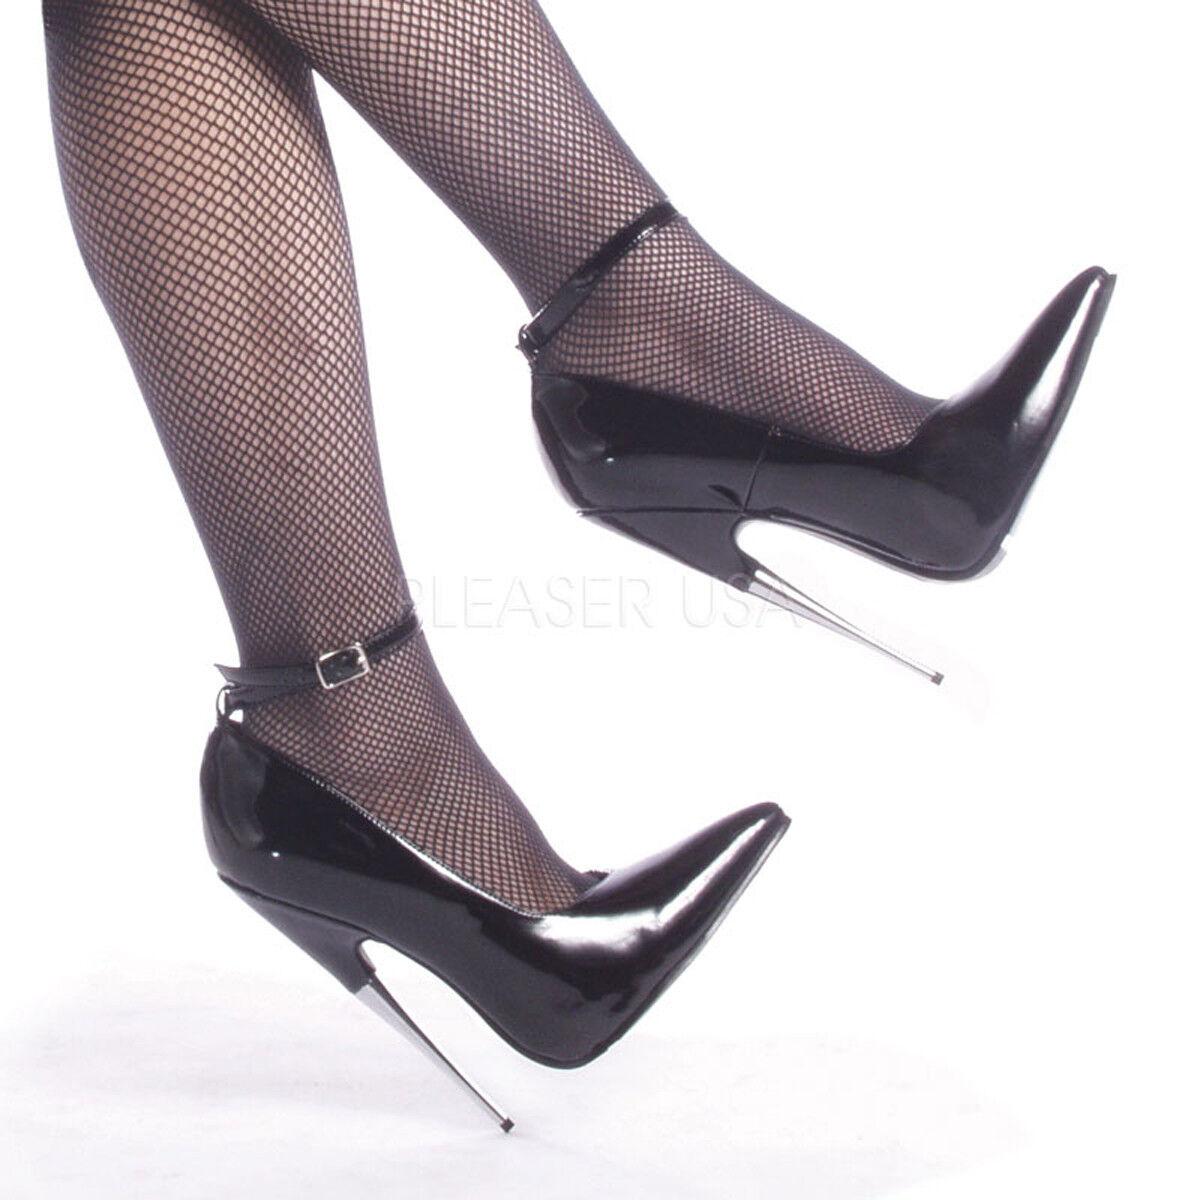 Devious SCREAM-12 Single Soles Black Patent Ankle Strap Stiletto Pump High Heels